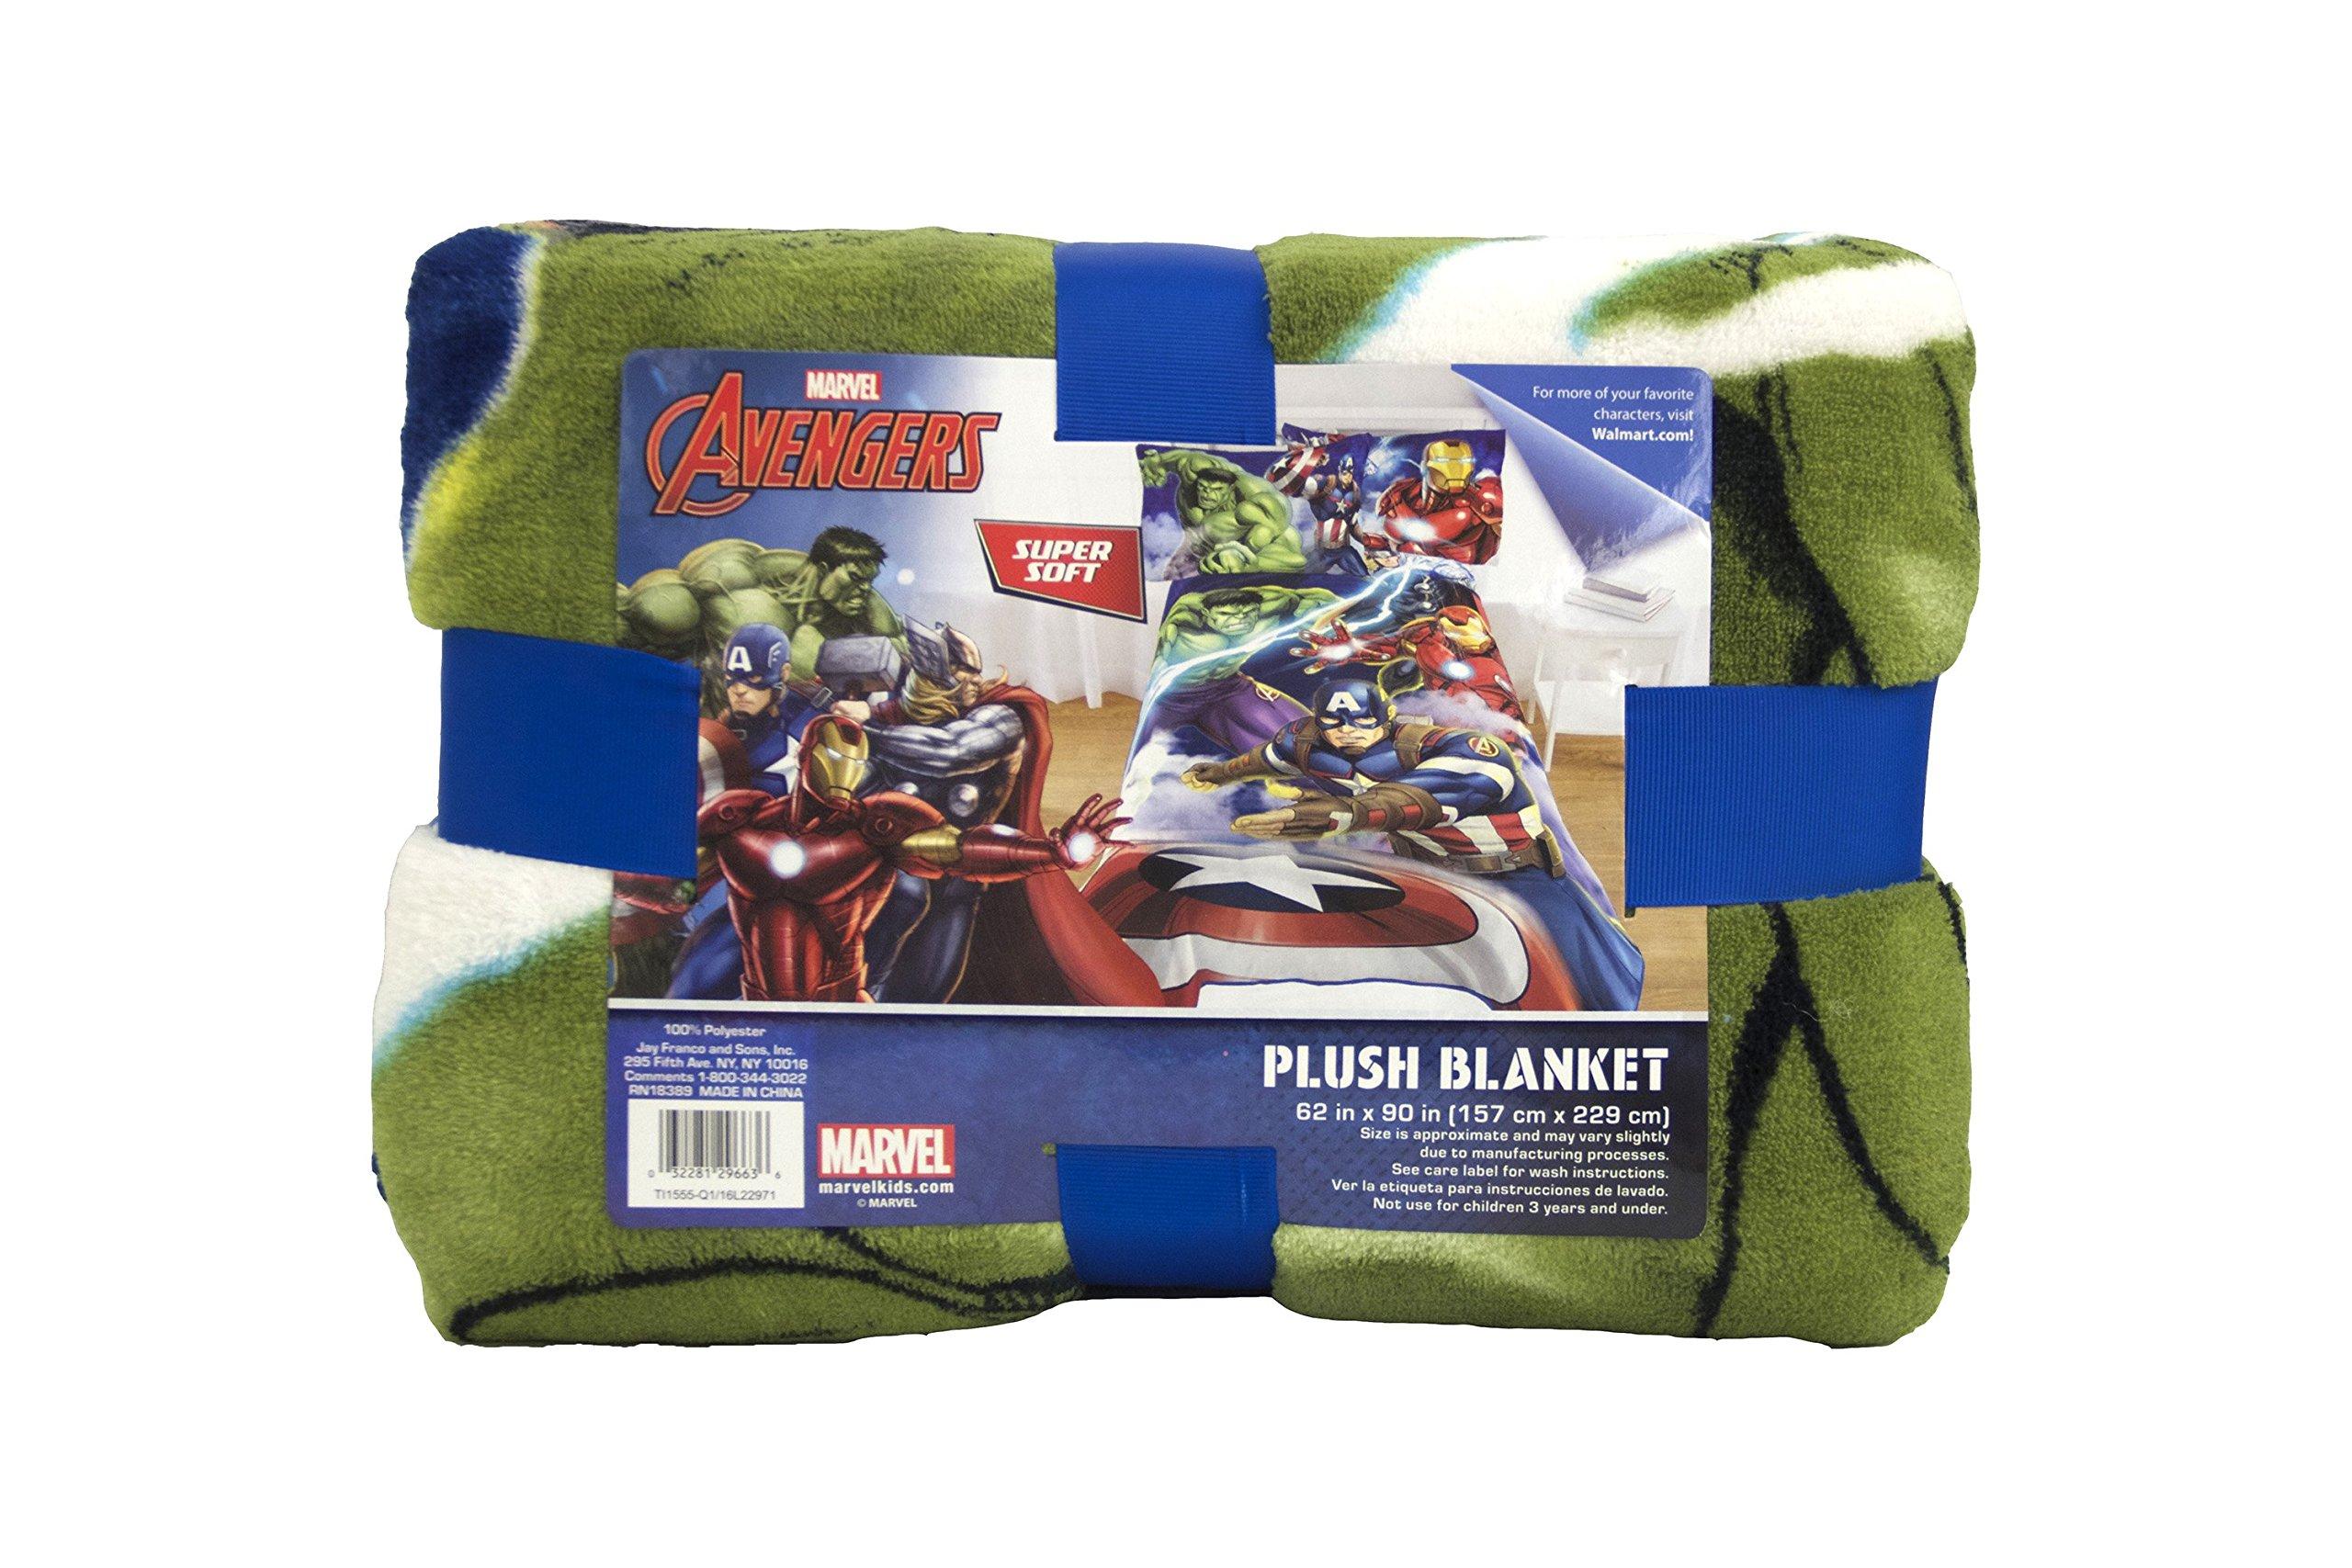 Marvel Avengers Blue Circle Fleece Plush Blanket, 62 x 90/Twin by Jay Franco (Image #4)